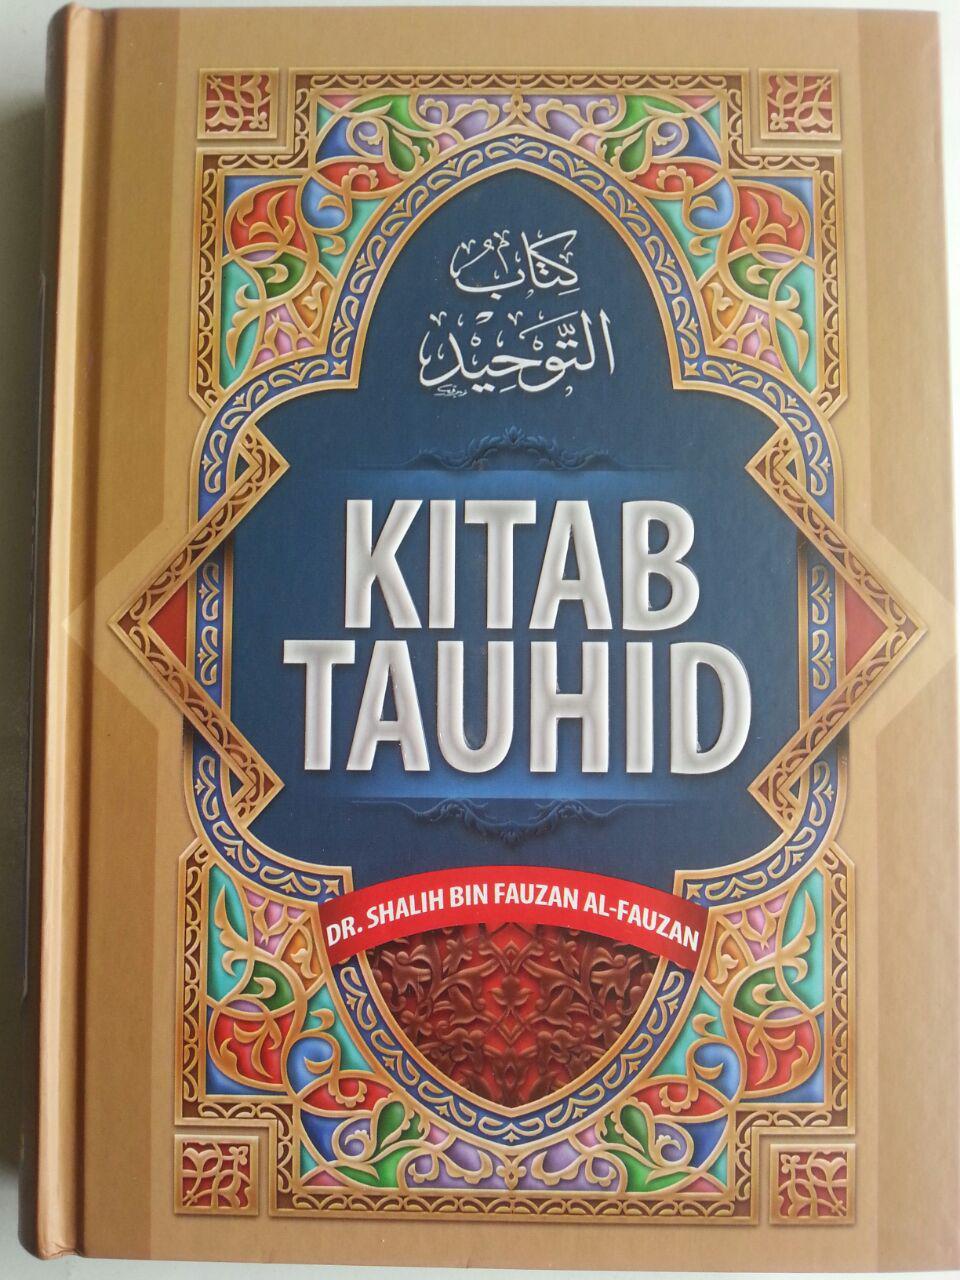 Buku Kitab Tauhid Syaikh Fauzan cover 2